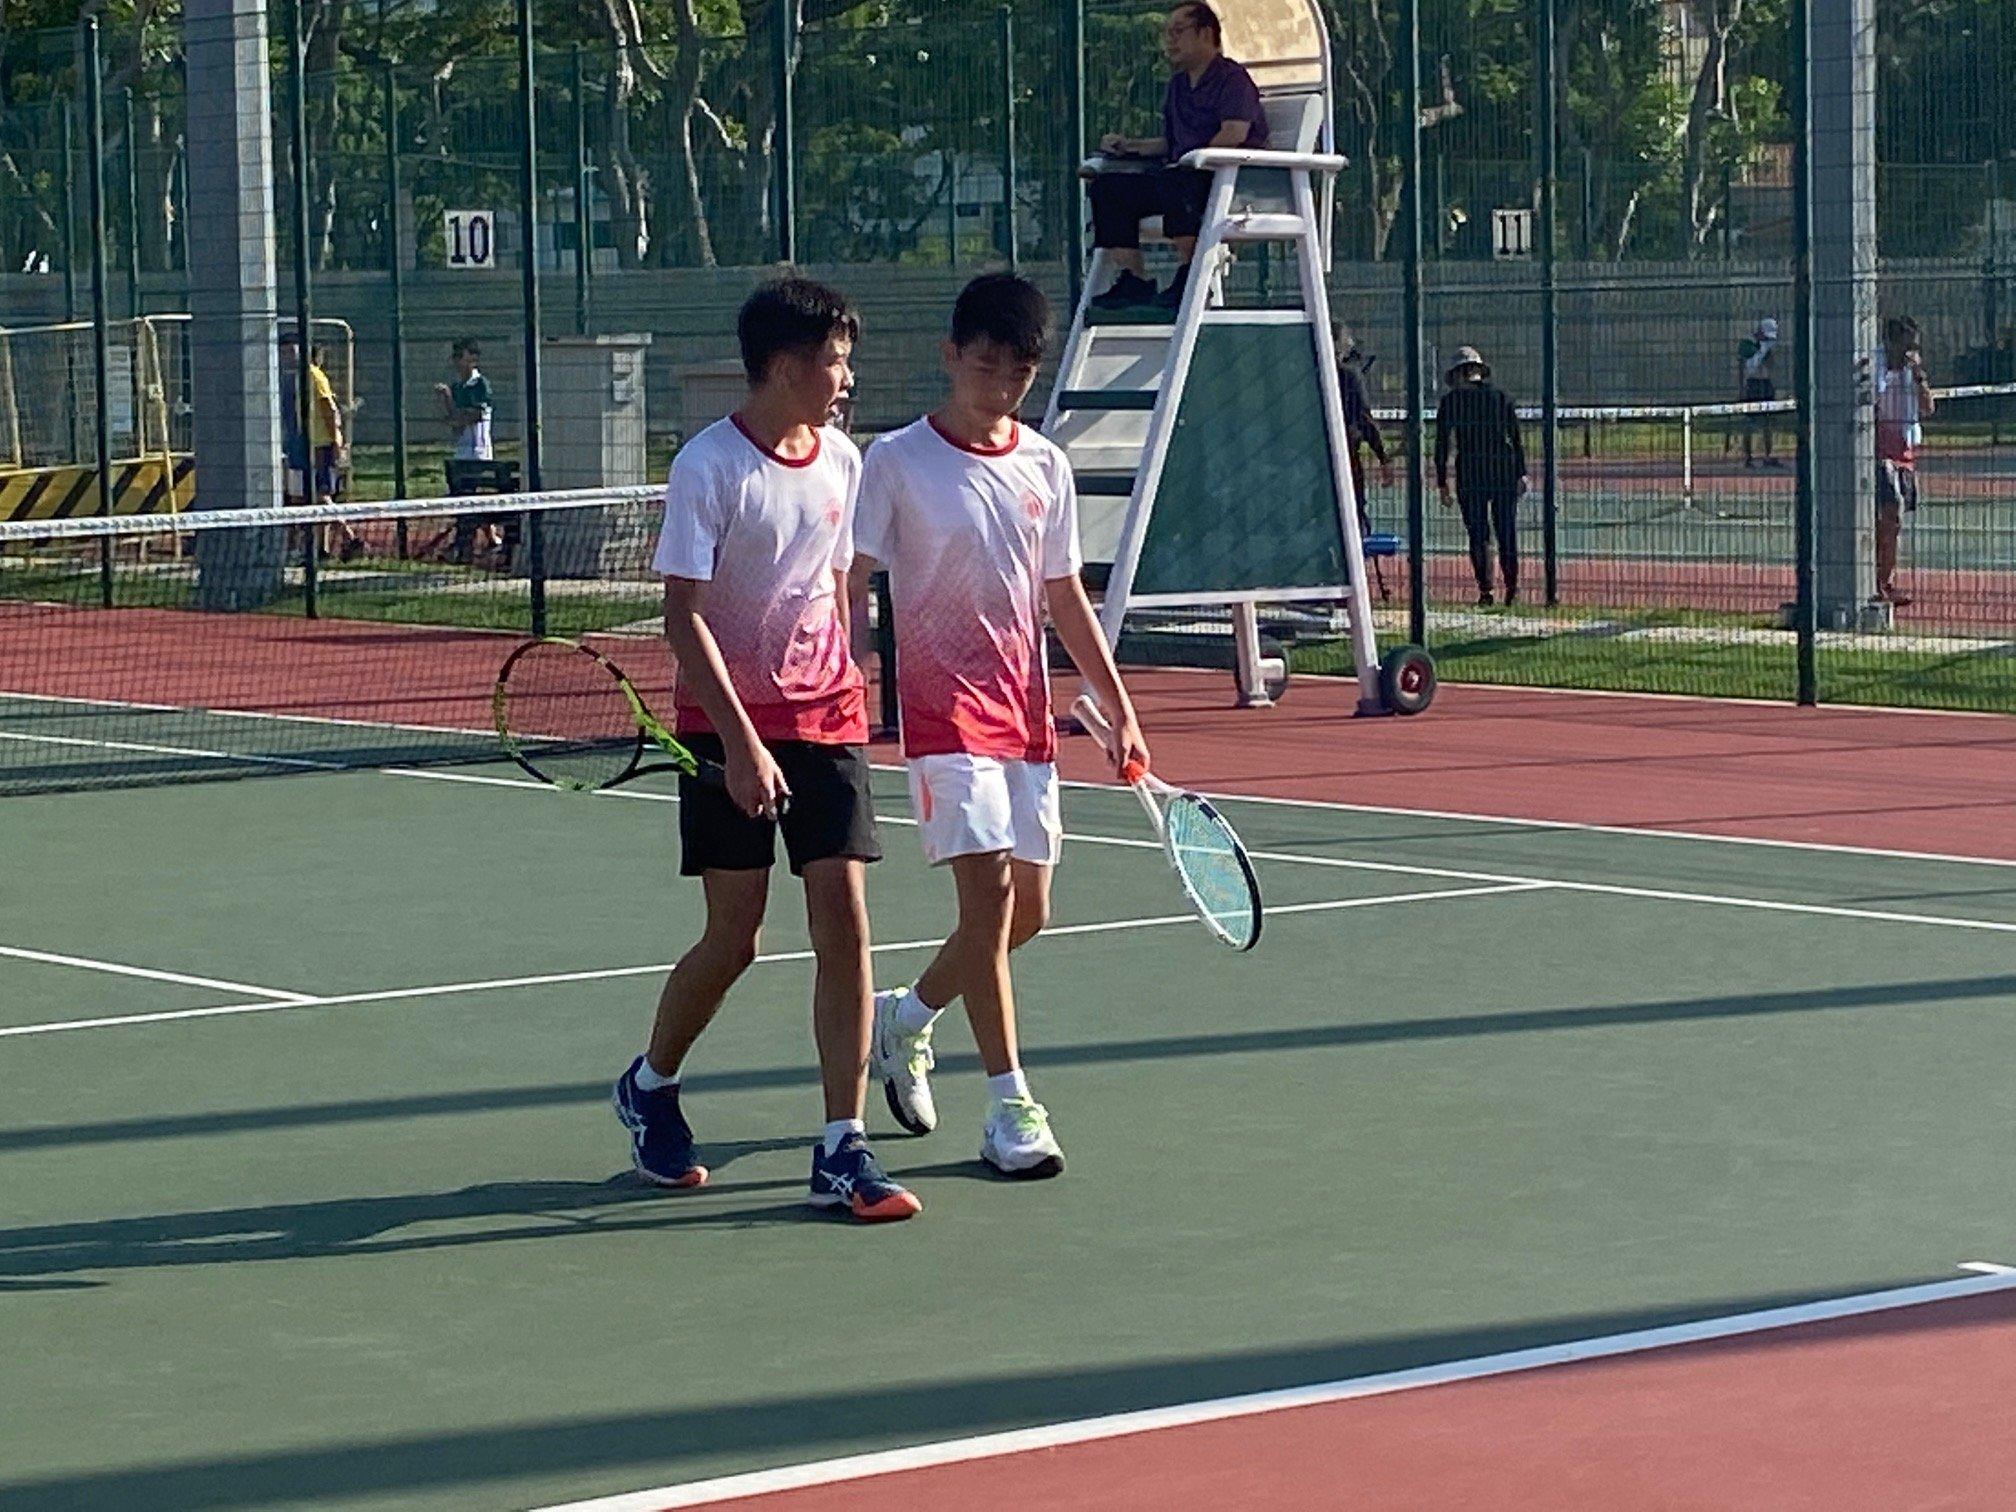 NSG B Division boys' tennis Victoria vs SJI 1st doubles